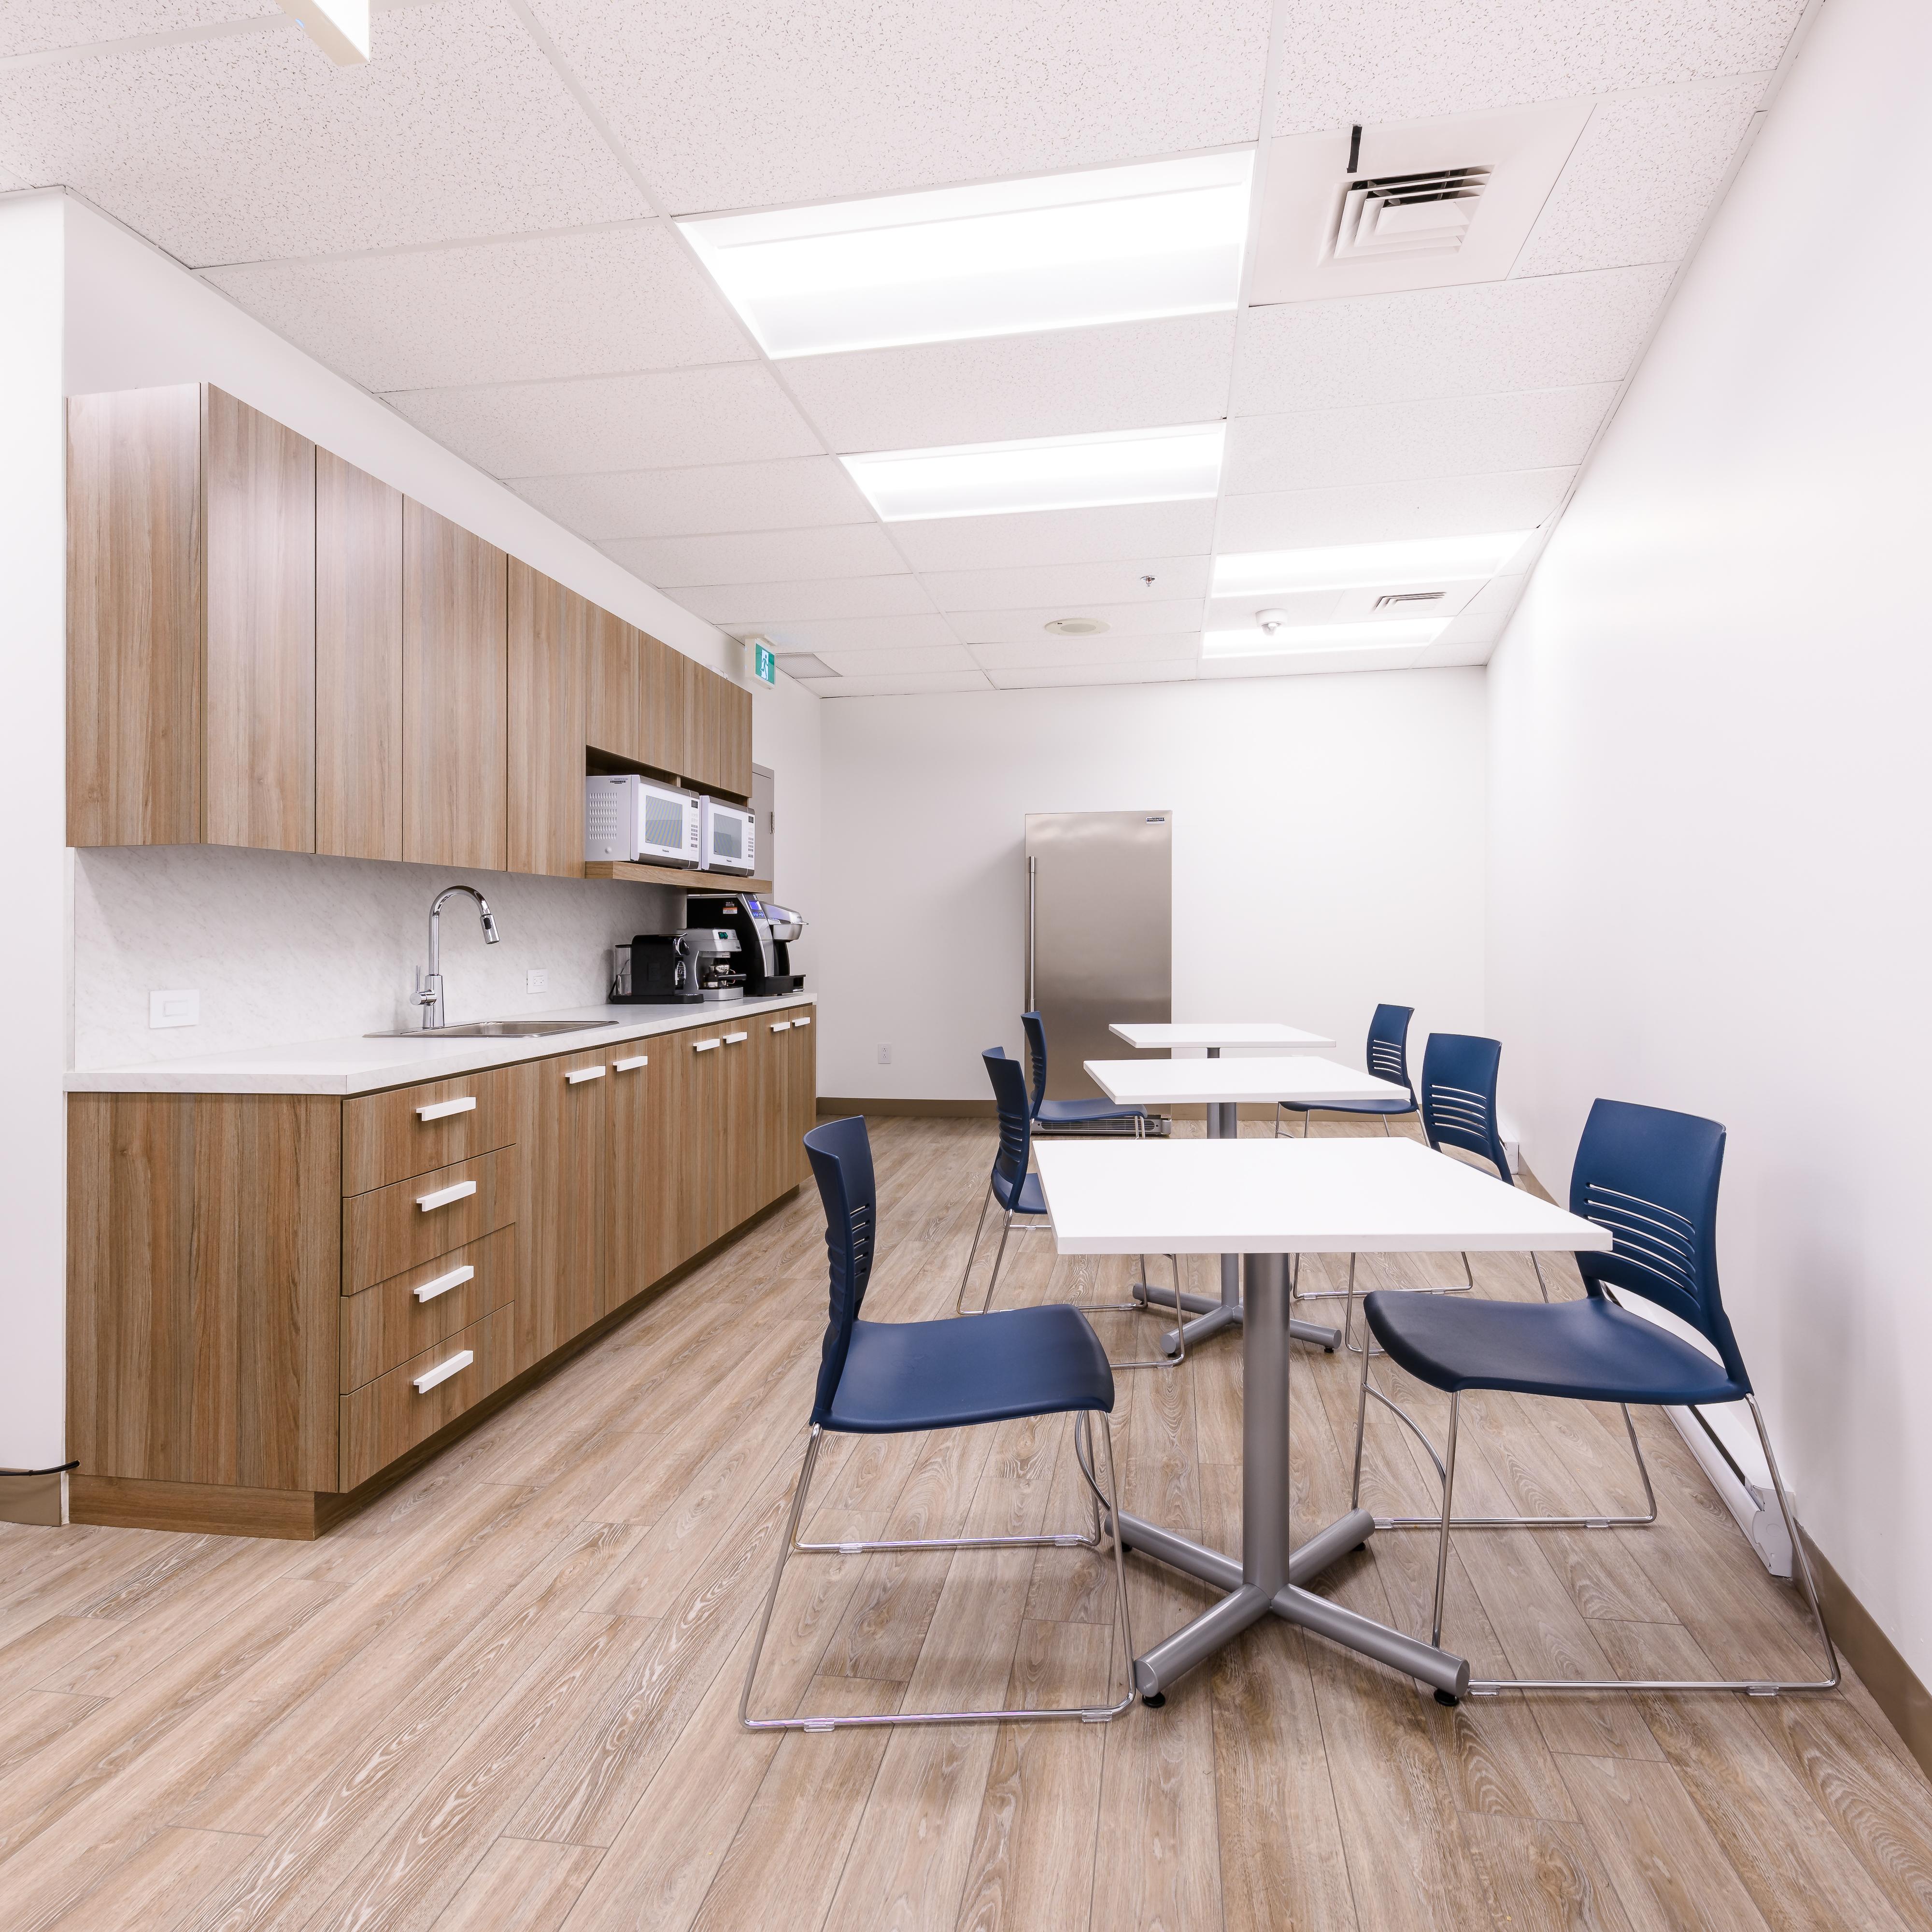 cuisine blanche cabinets bois